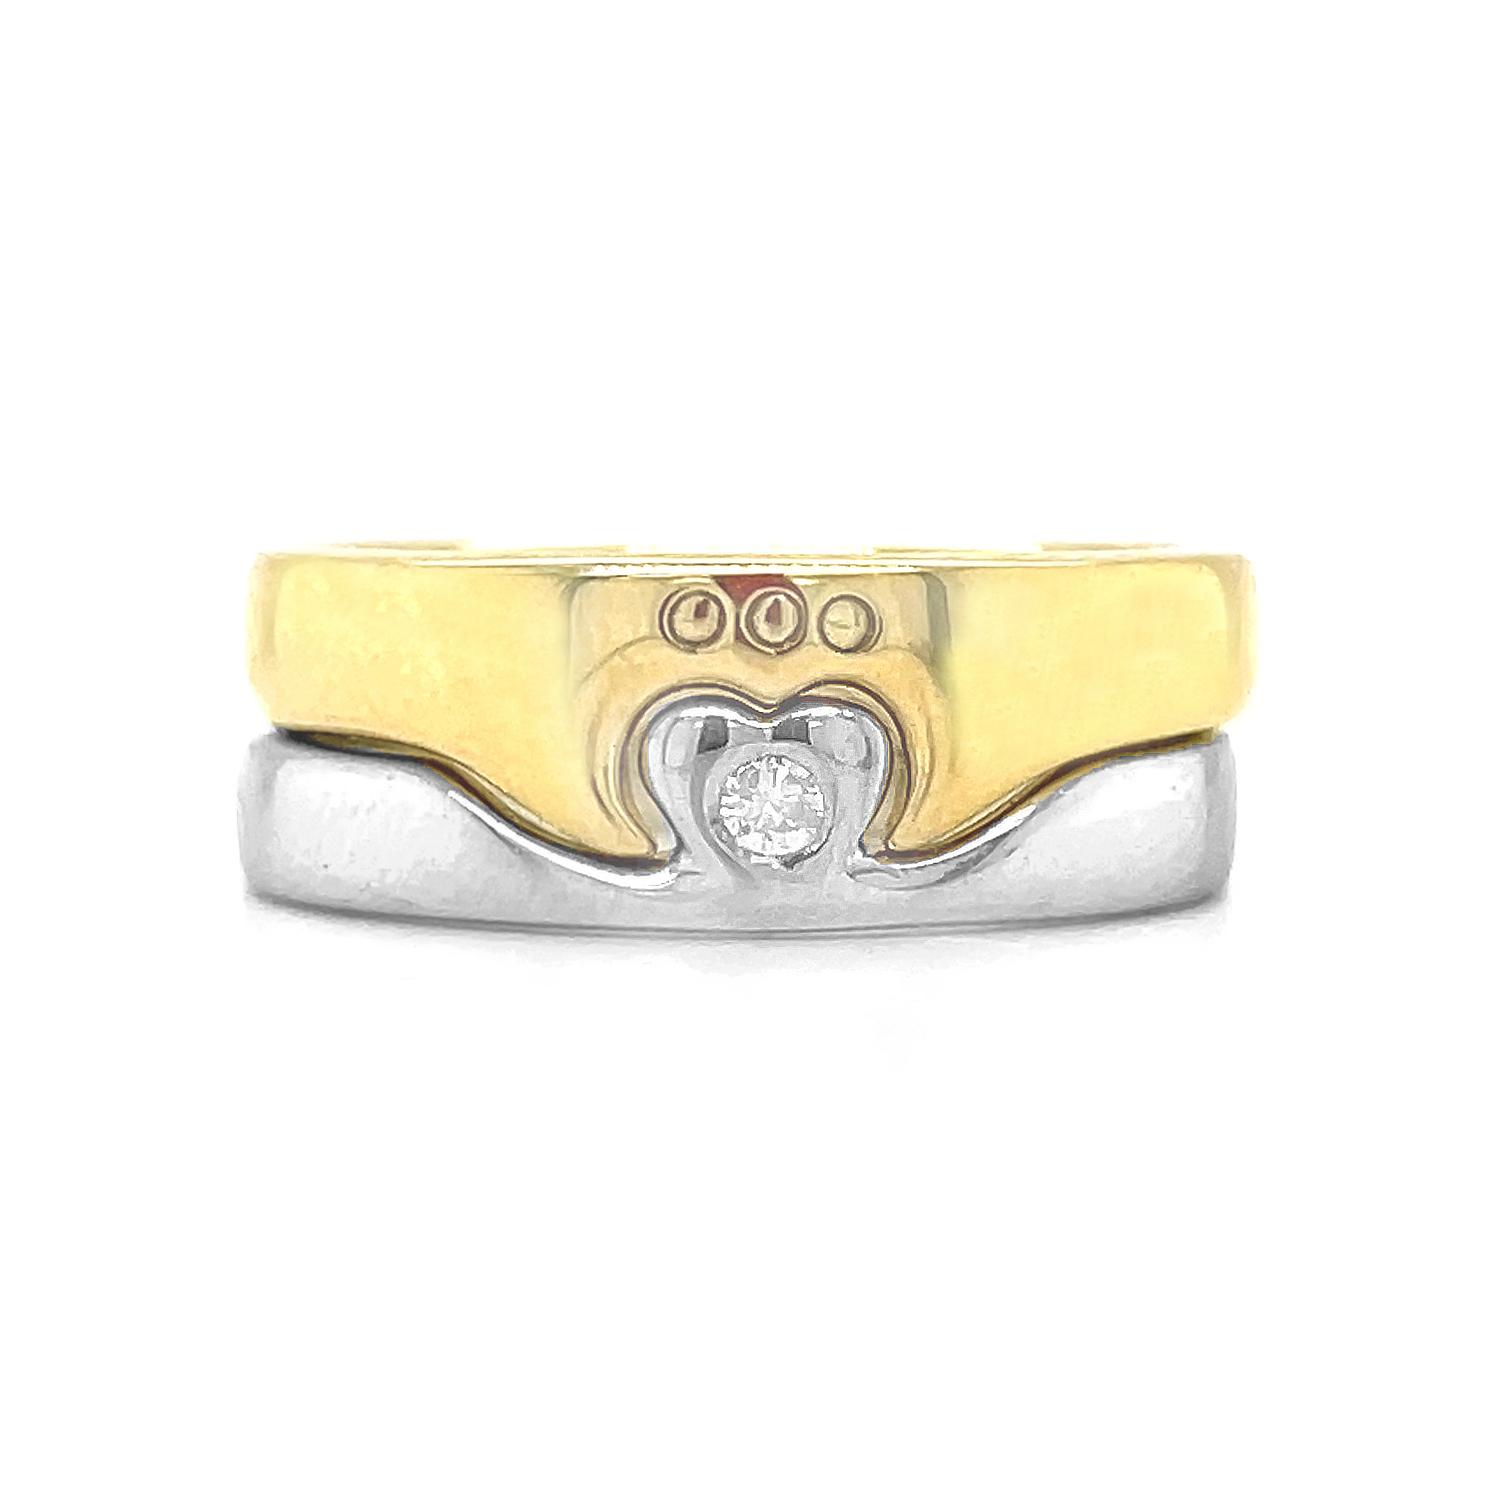 2 Part Diamond Claddagh Ring